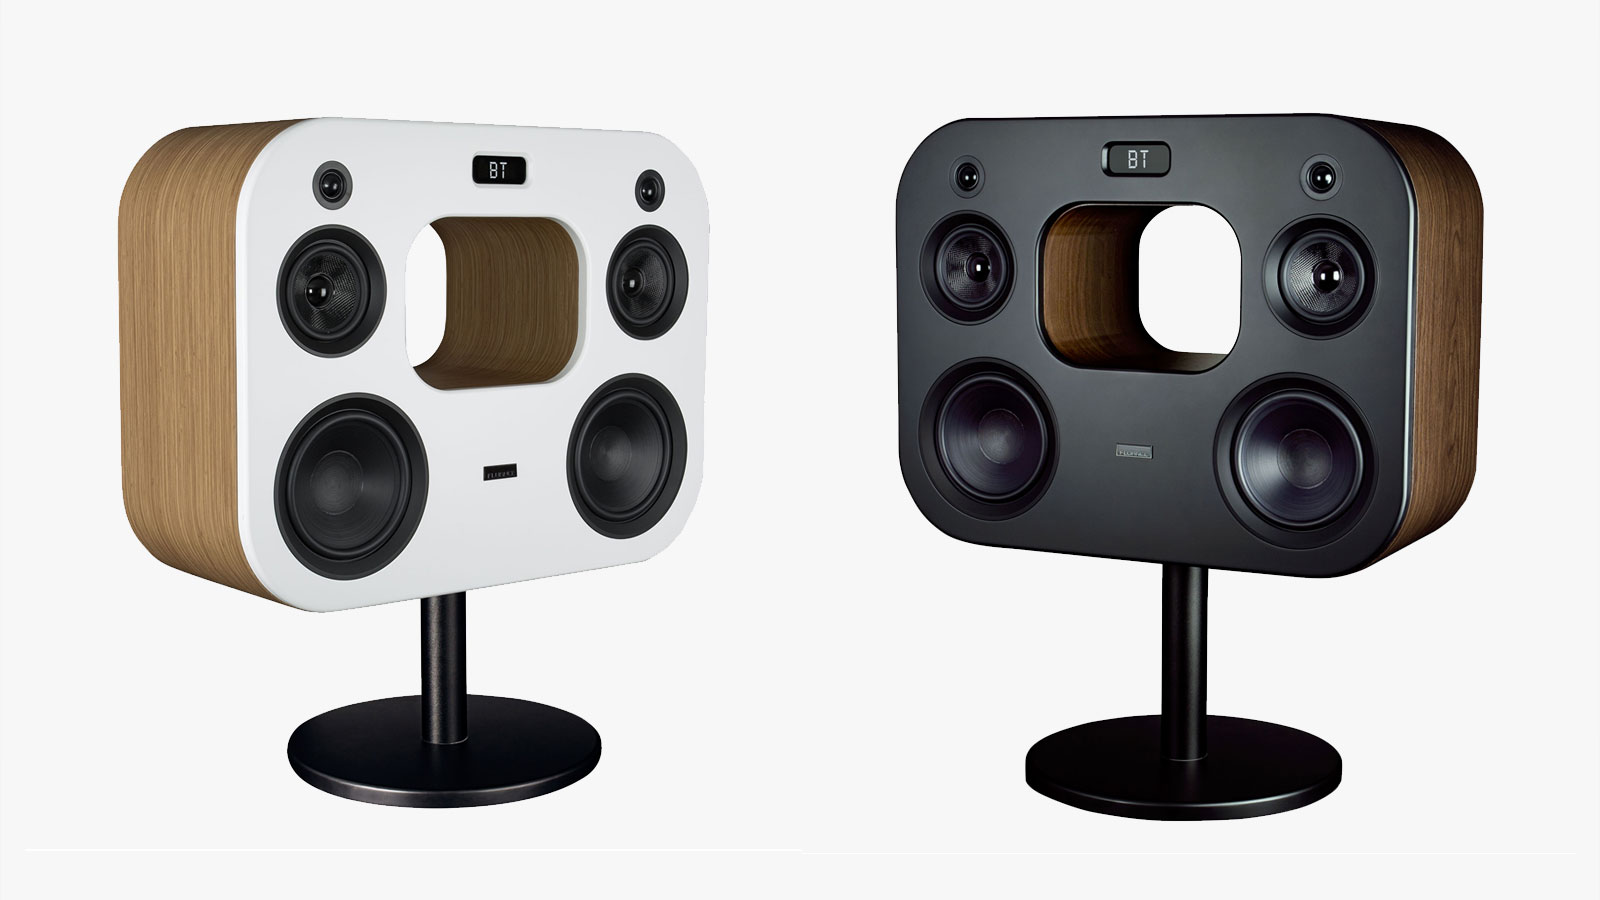 Fluance-Fi70-High-Fidelity-Bluetooth-speaker-01